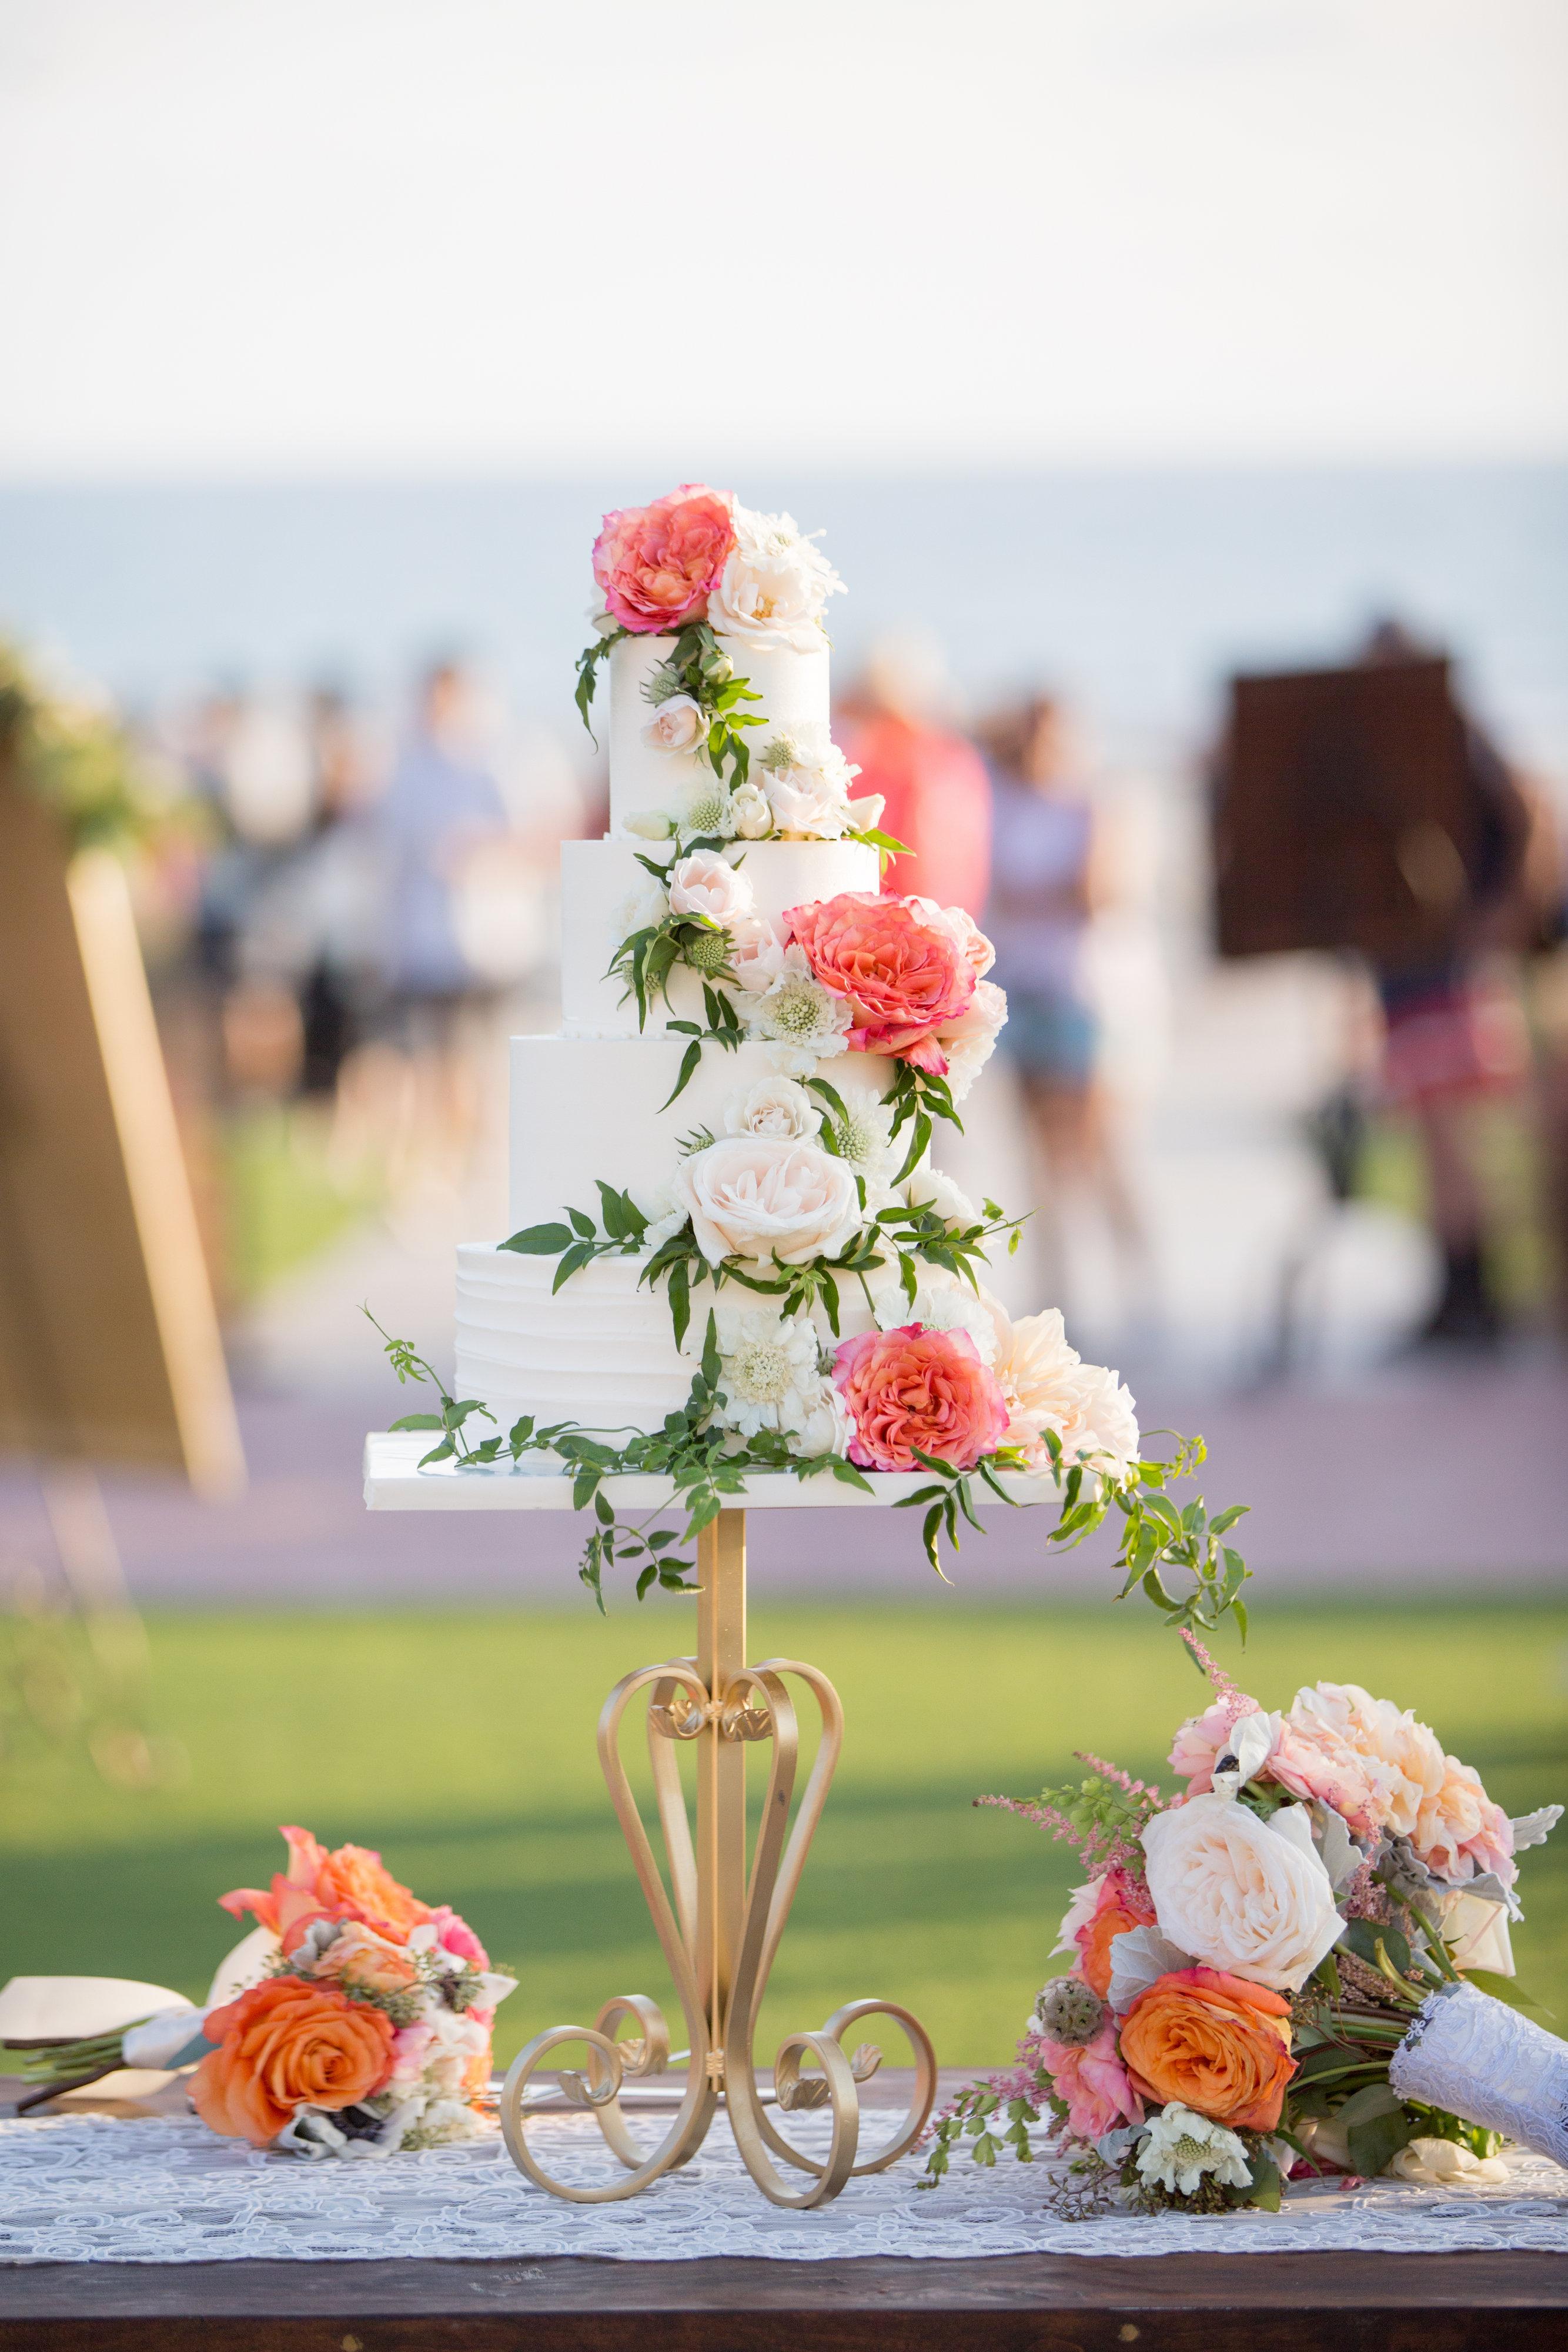 fabulous-floral-cake-by-sweet-cheeks-lauren-at-hotel-del-sara-france-studios